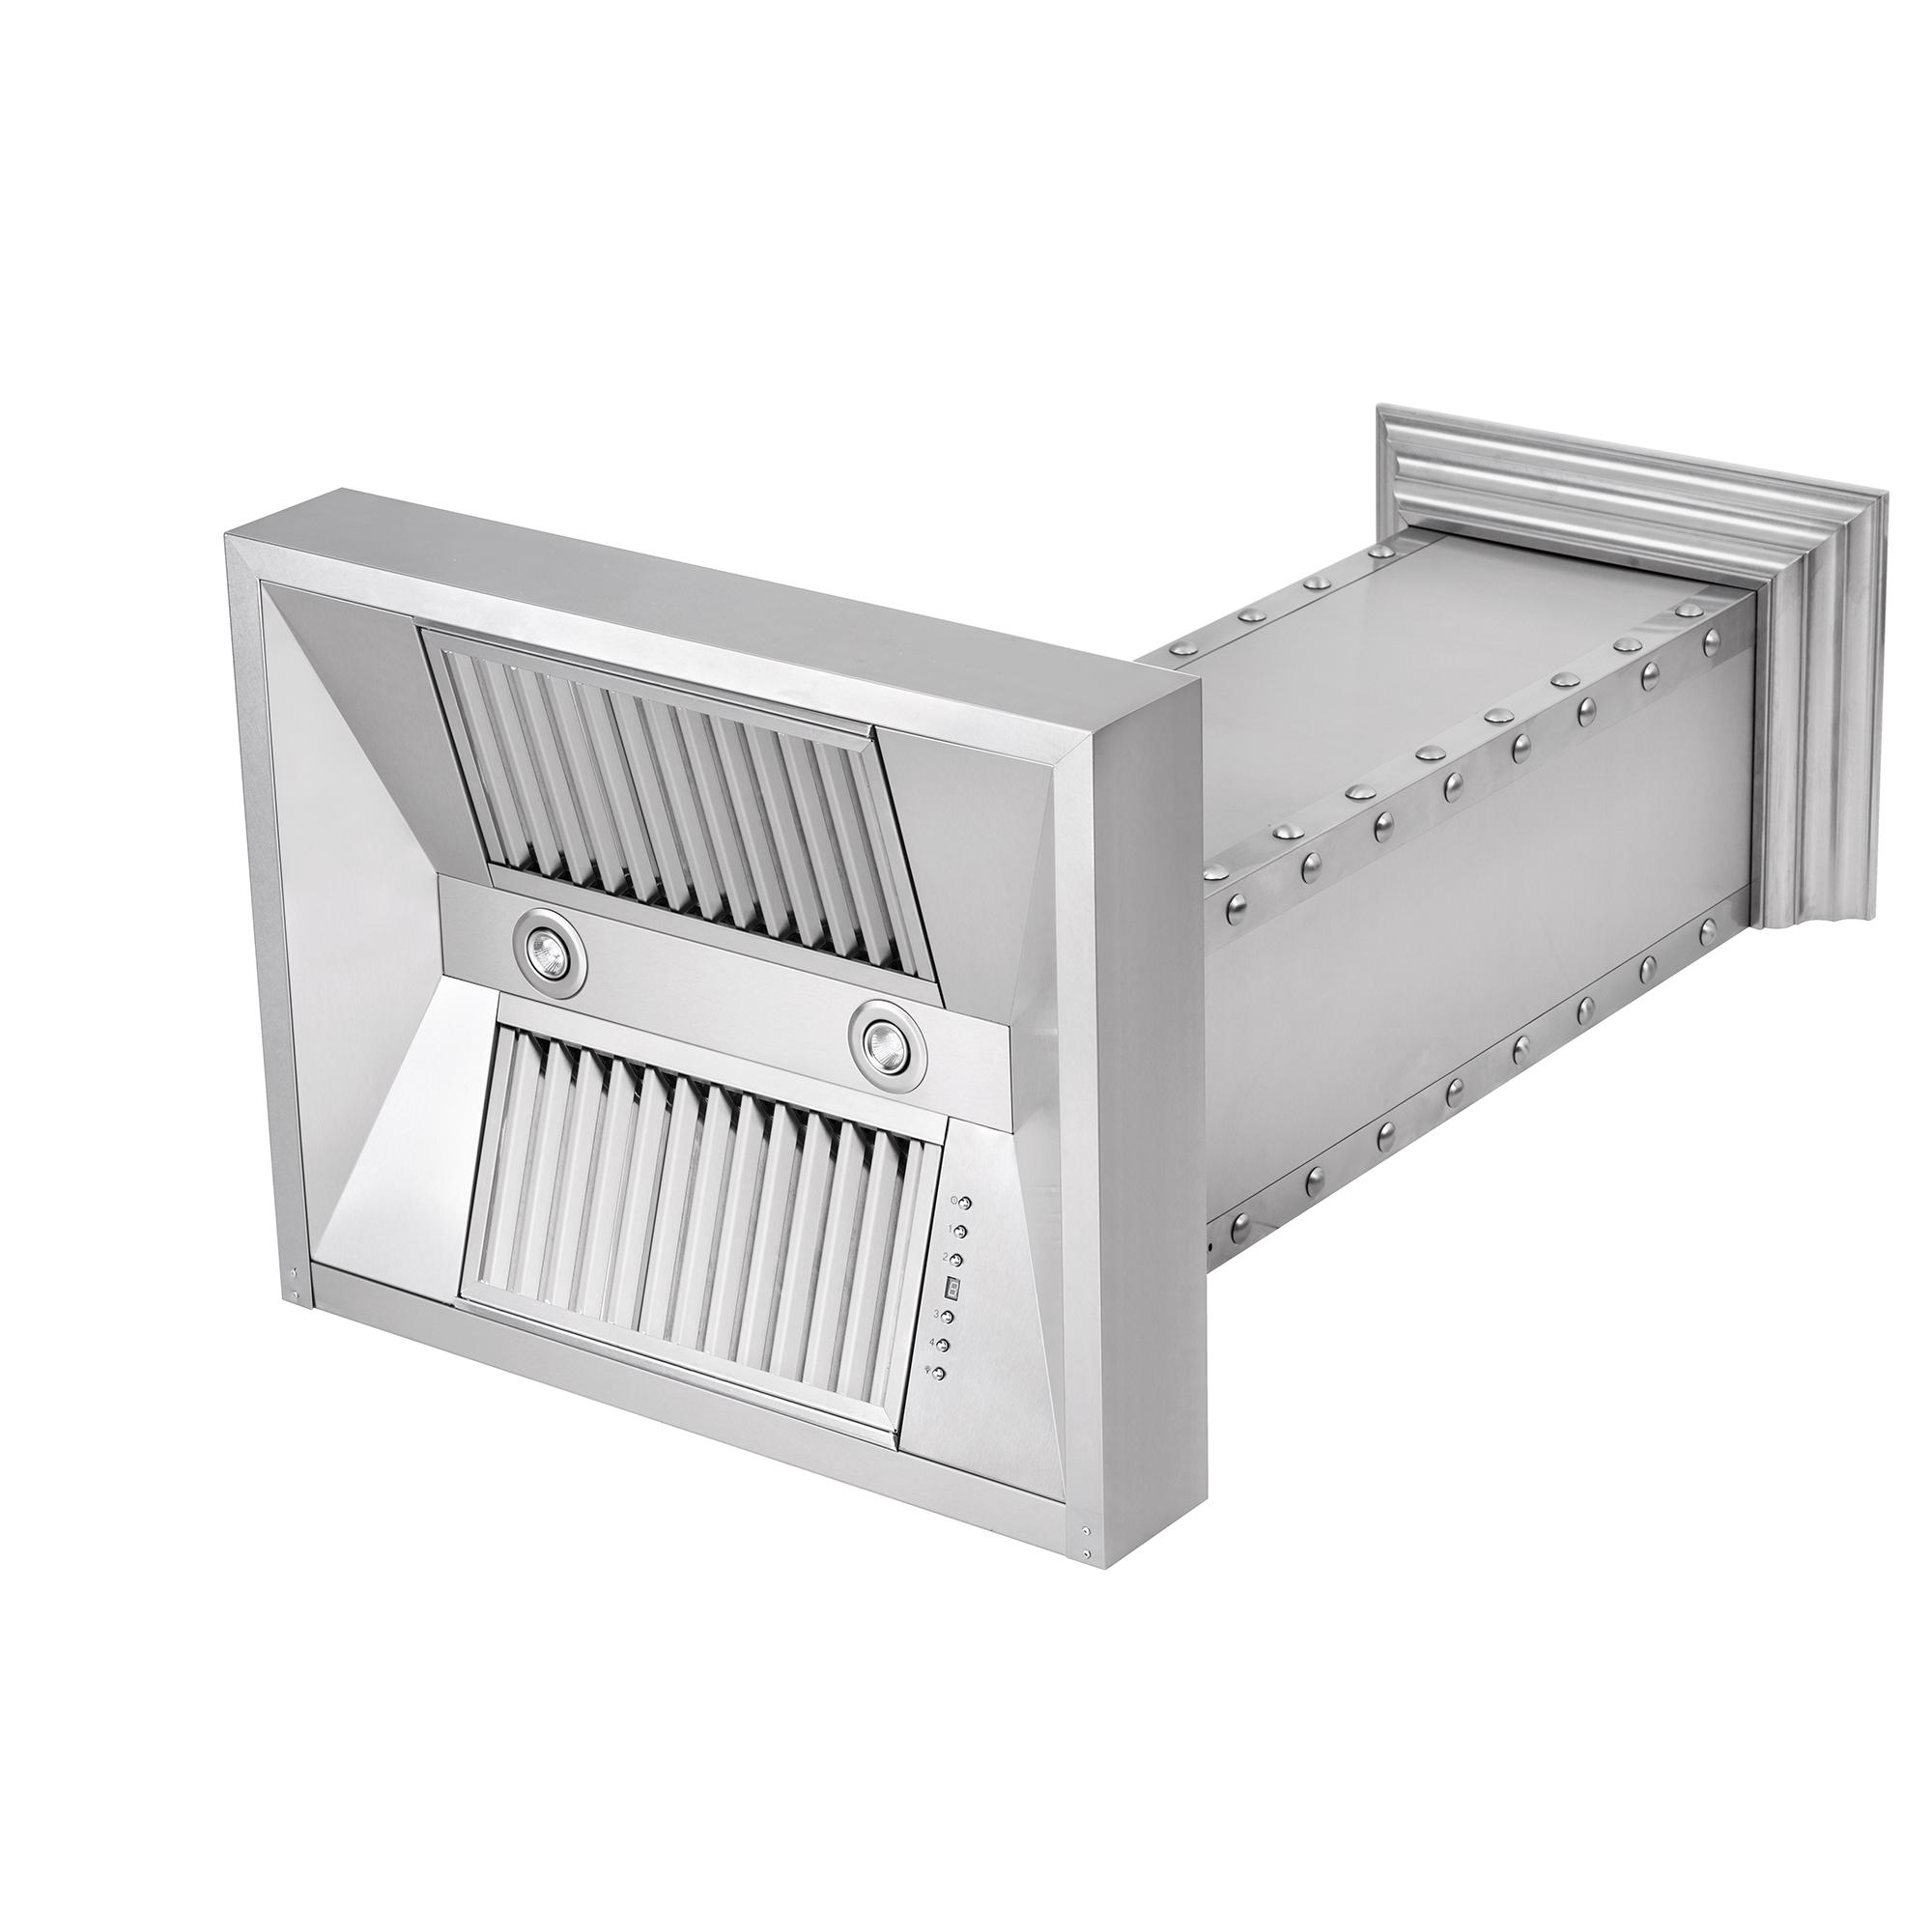 zline-stainless-steel-wall-mounted-range-hood-655-4SSSS-underneath 1.jpg